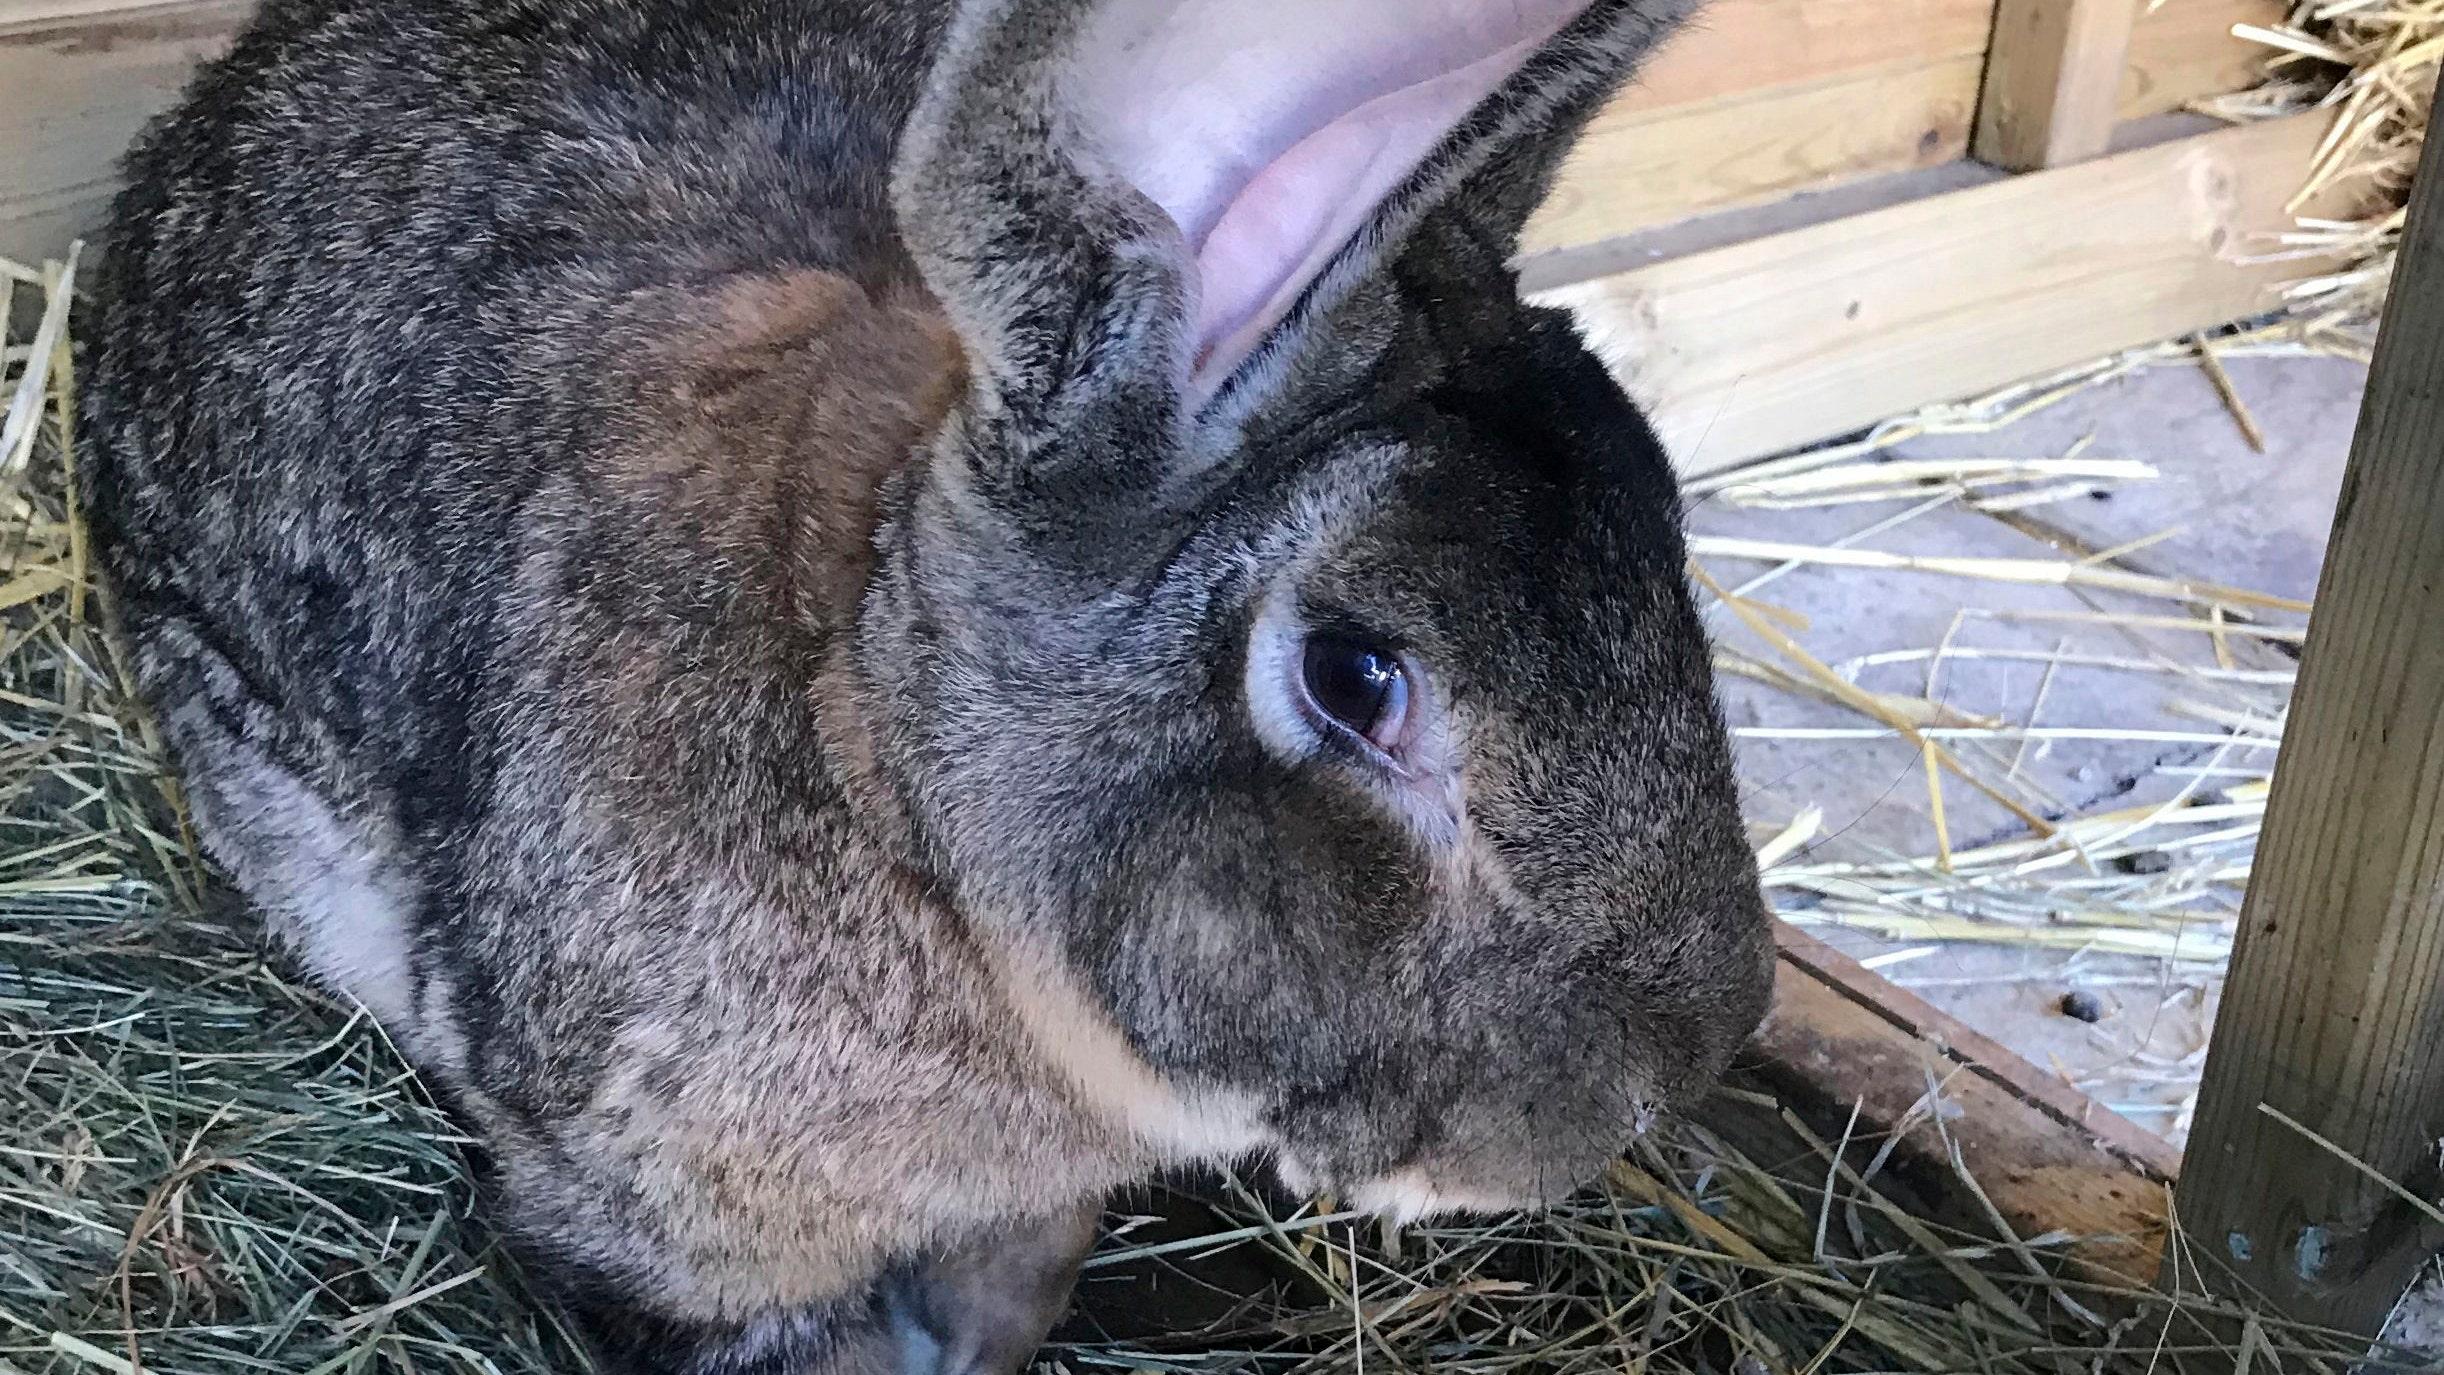 World's longest bunny stolen from former Playboy model: police - Fox News